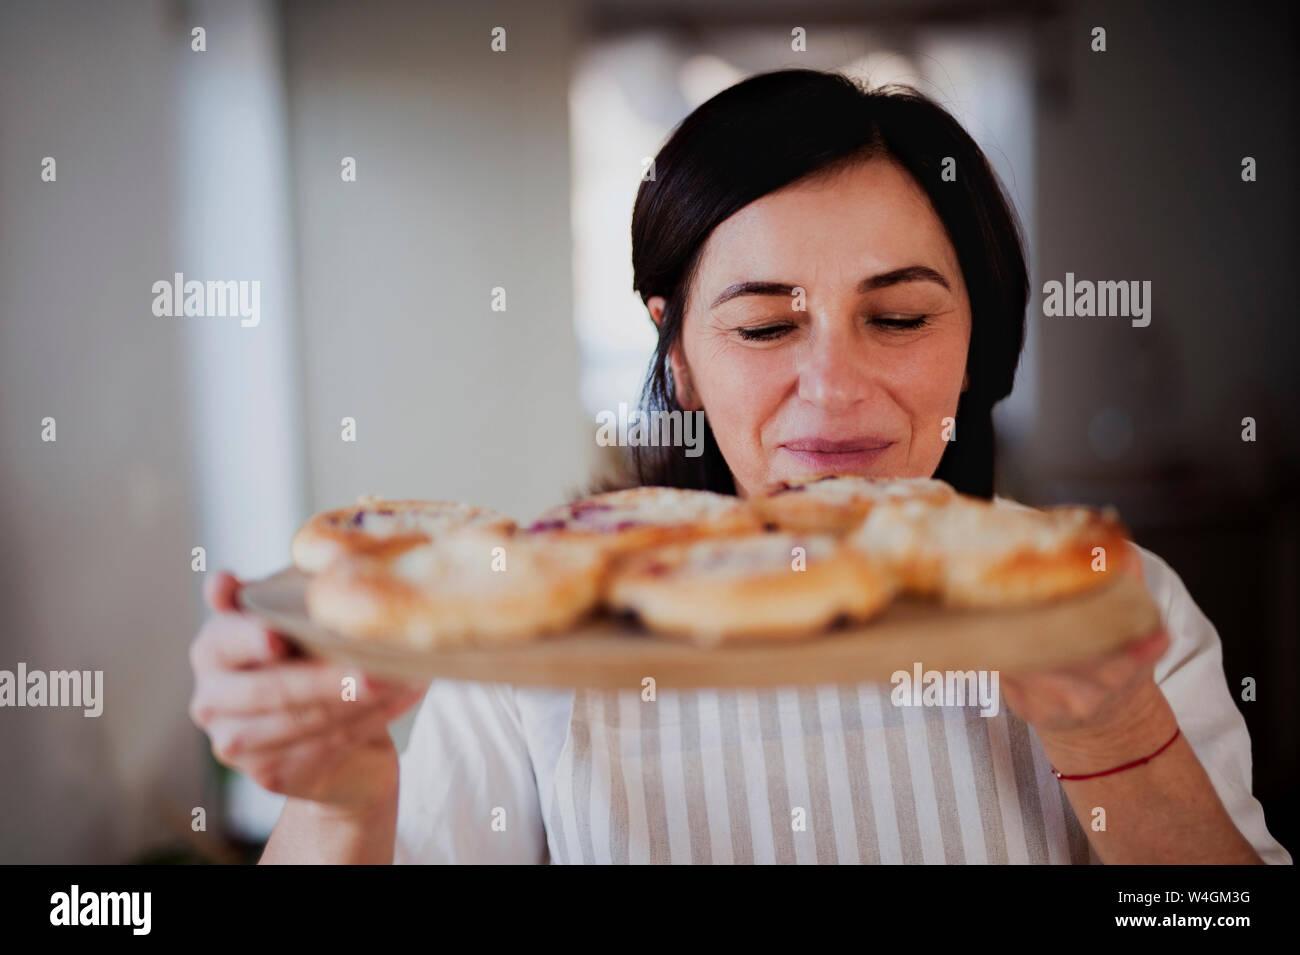 Mujer madura que sirve tartas caseras ona bandeja de madera Foto de stock